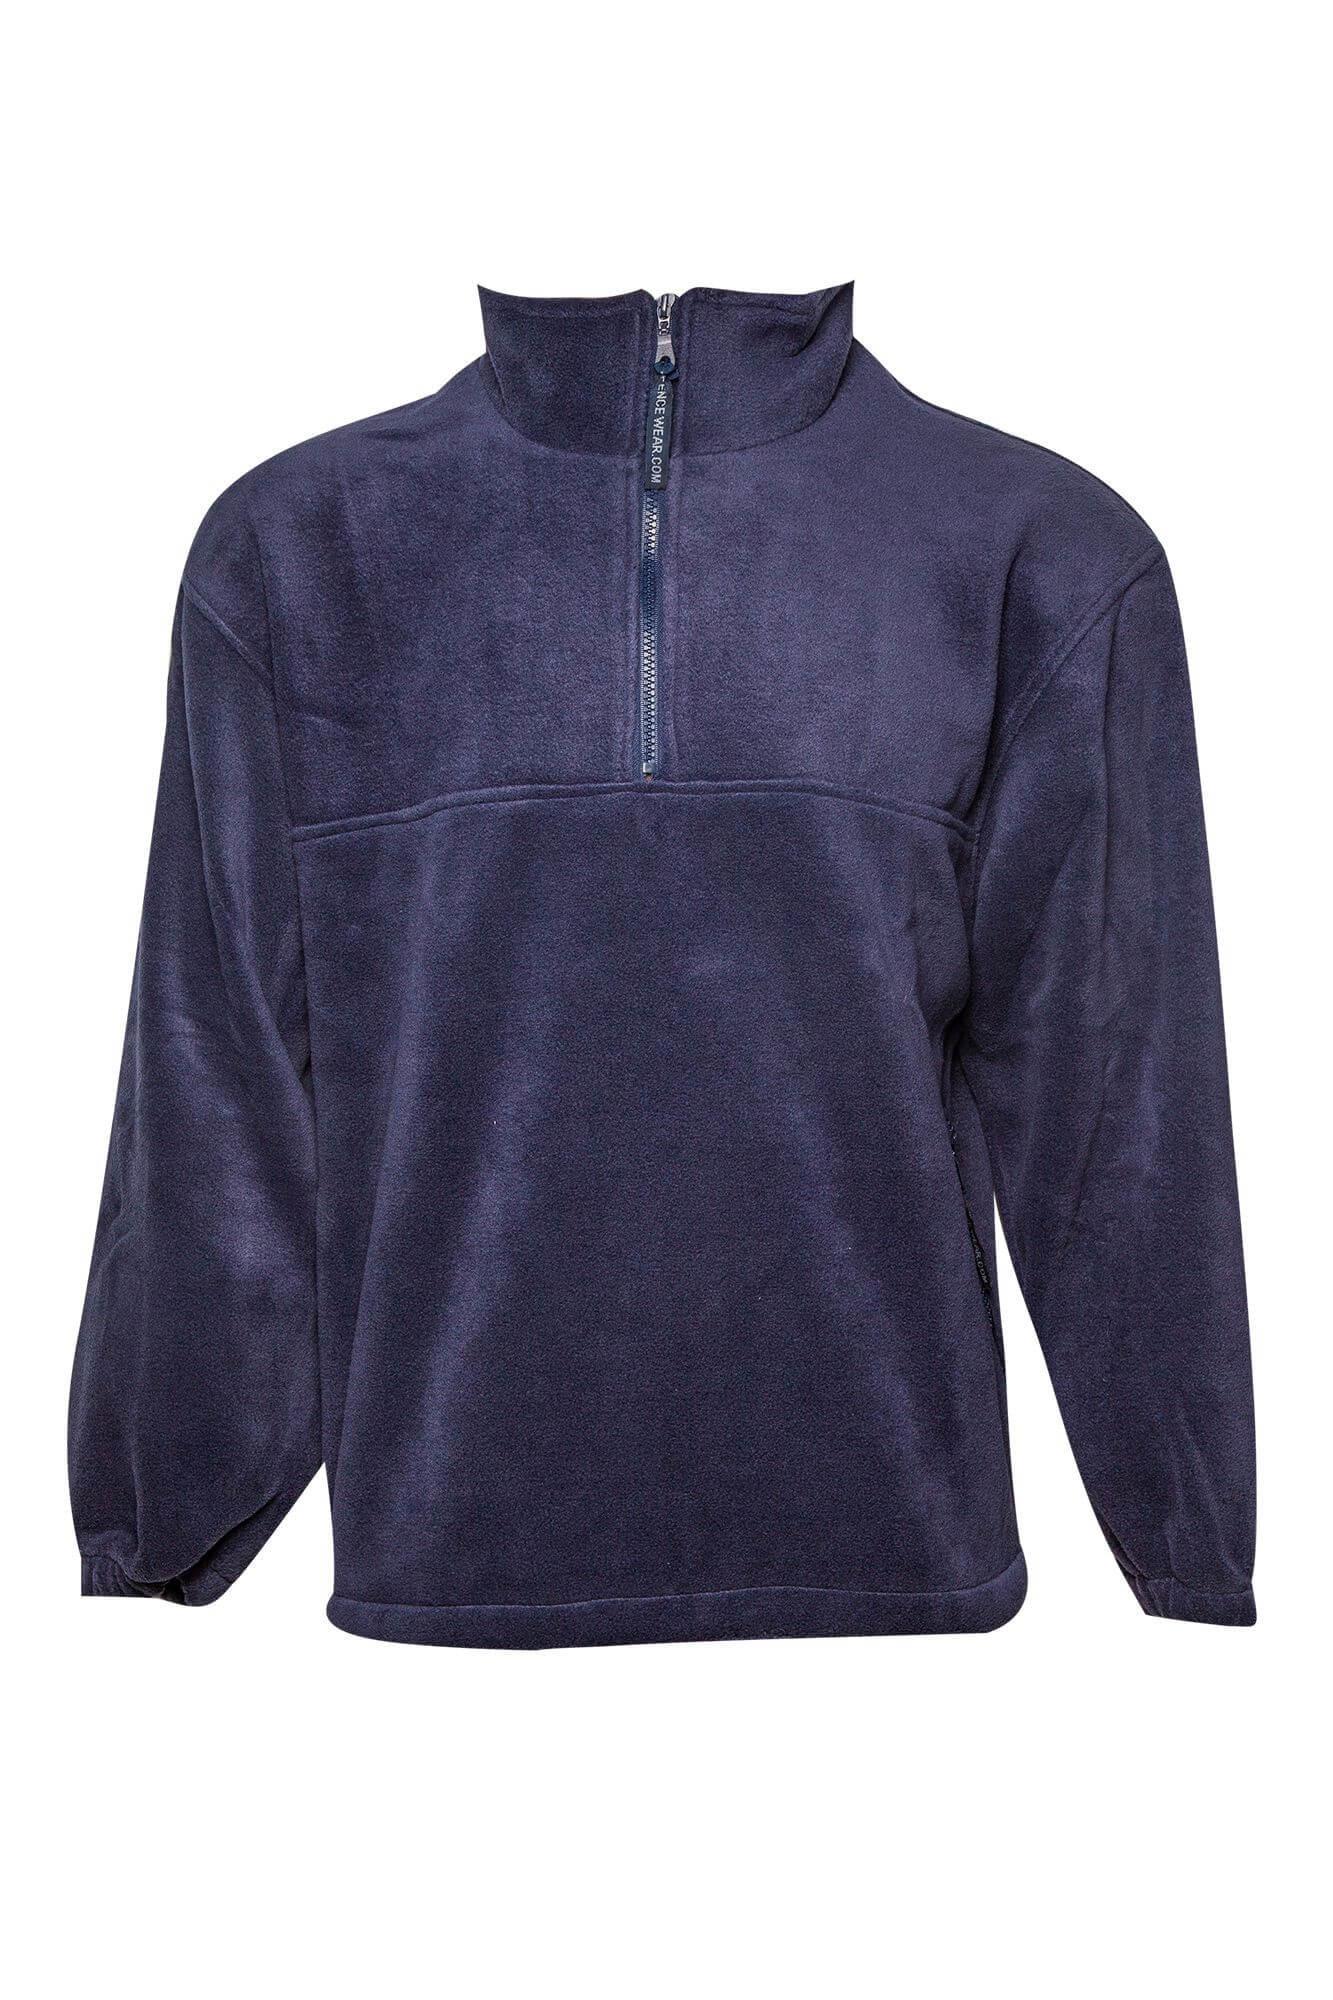 magazin destul de ieftin preț atractiv قاعدة قارب هوس pulovere barbati rosii cu fermoar - pleasantgroveumc.net